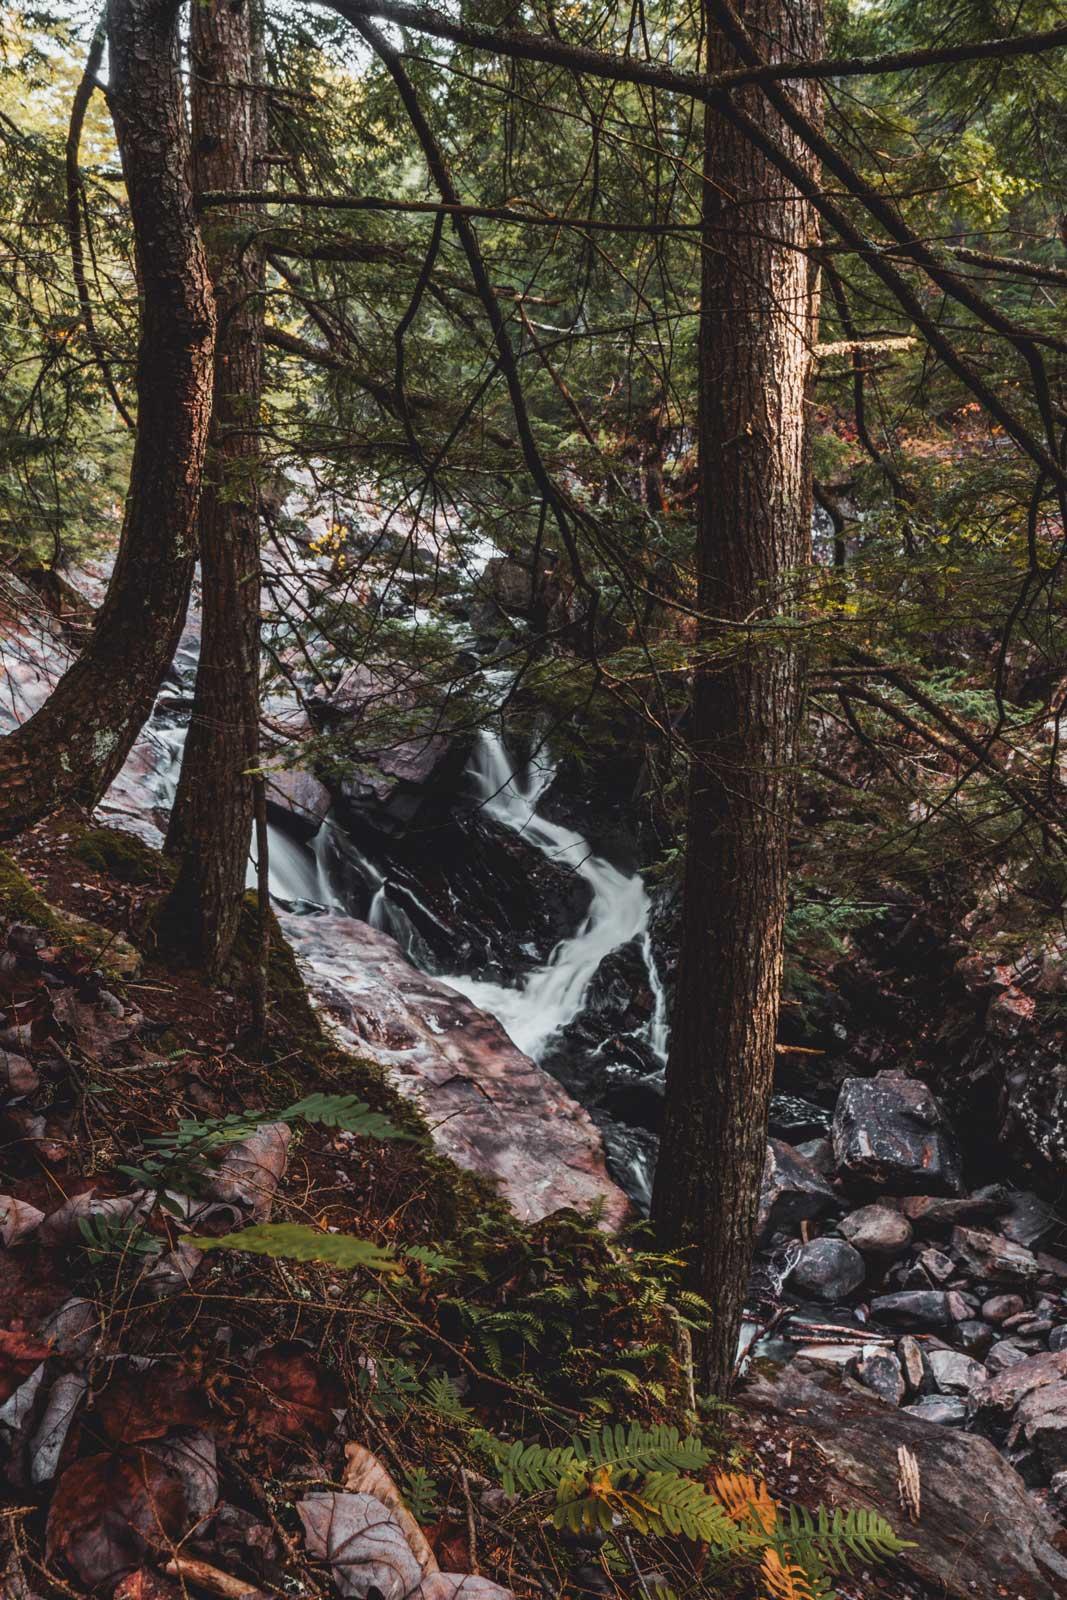 Auger-Falls-near-Wells-New-York-in-the-Adirondacks